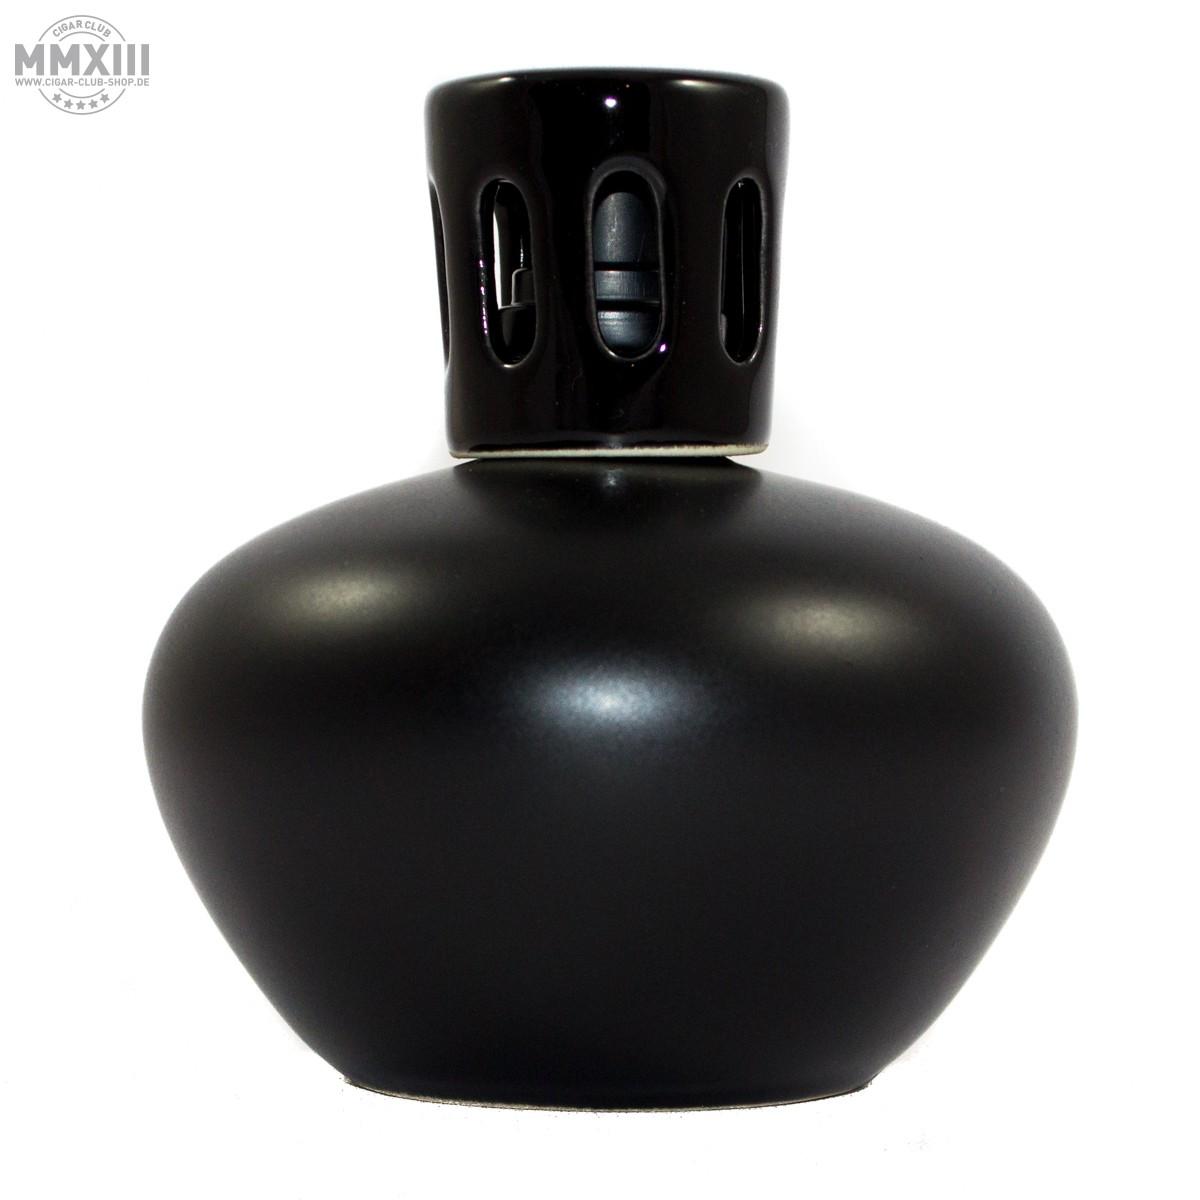 duftlampe millefiori keramik schwarz klein cigar club shop mmxiii kg. Black Bedroom Furniture Sets. Home Design Ideas